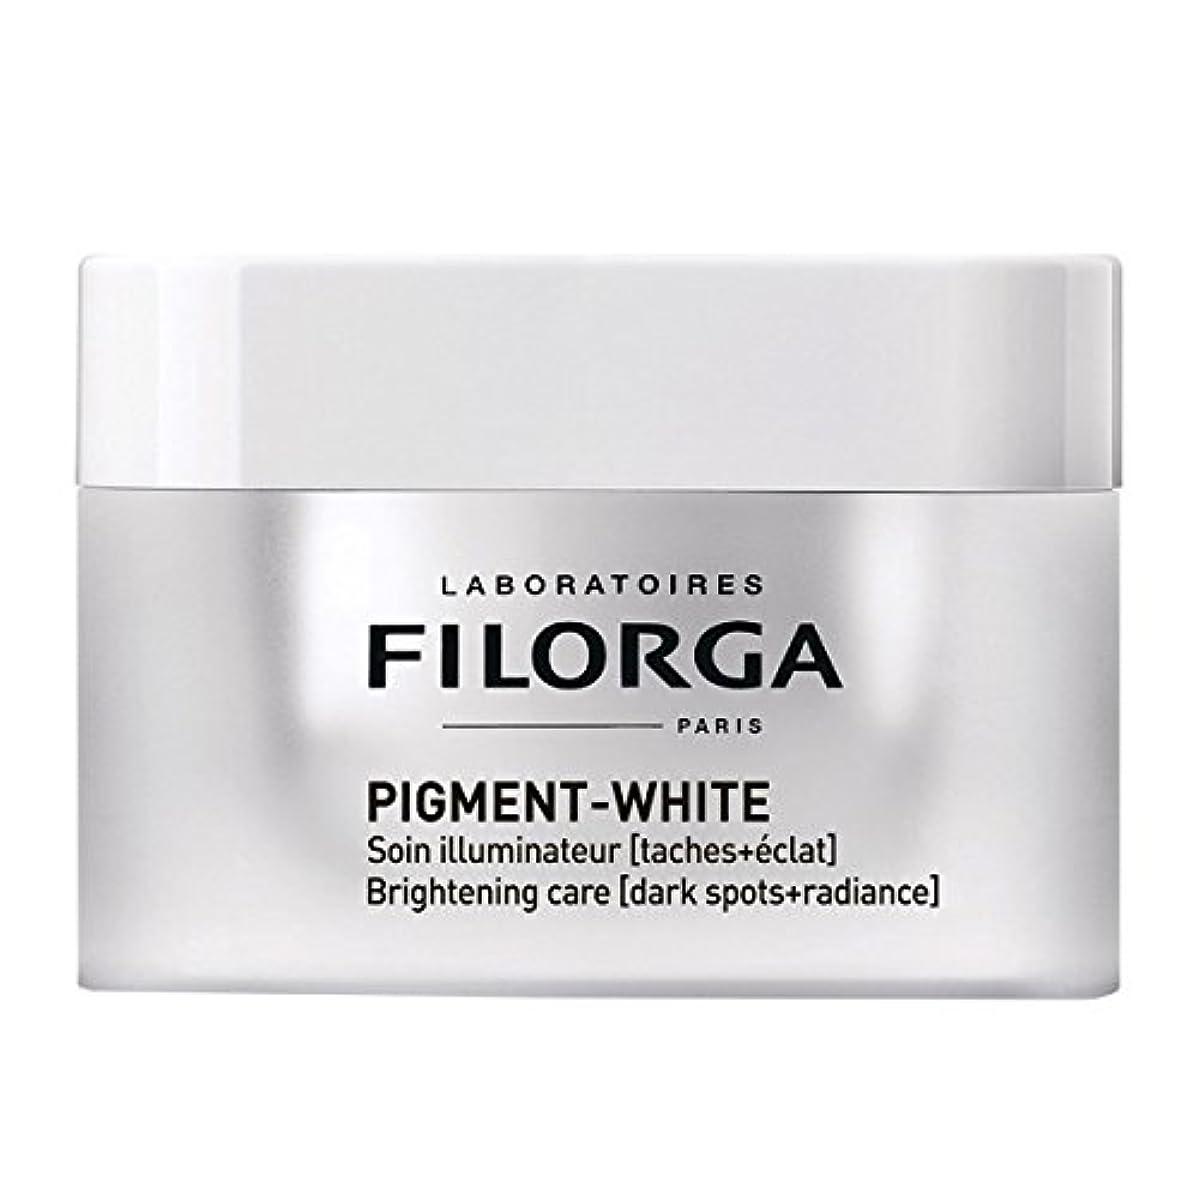 ミス励起馬鹿Filorga Pigment-white 50ml [並行輸入品]